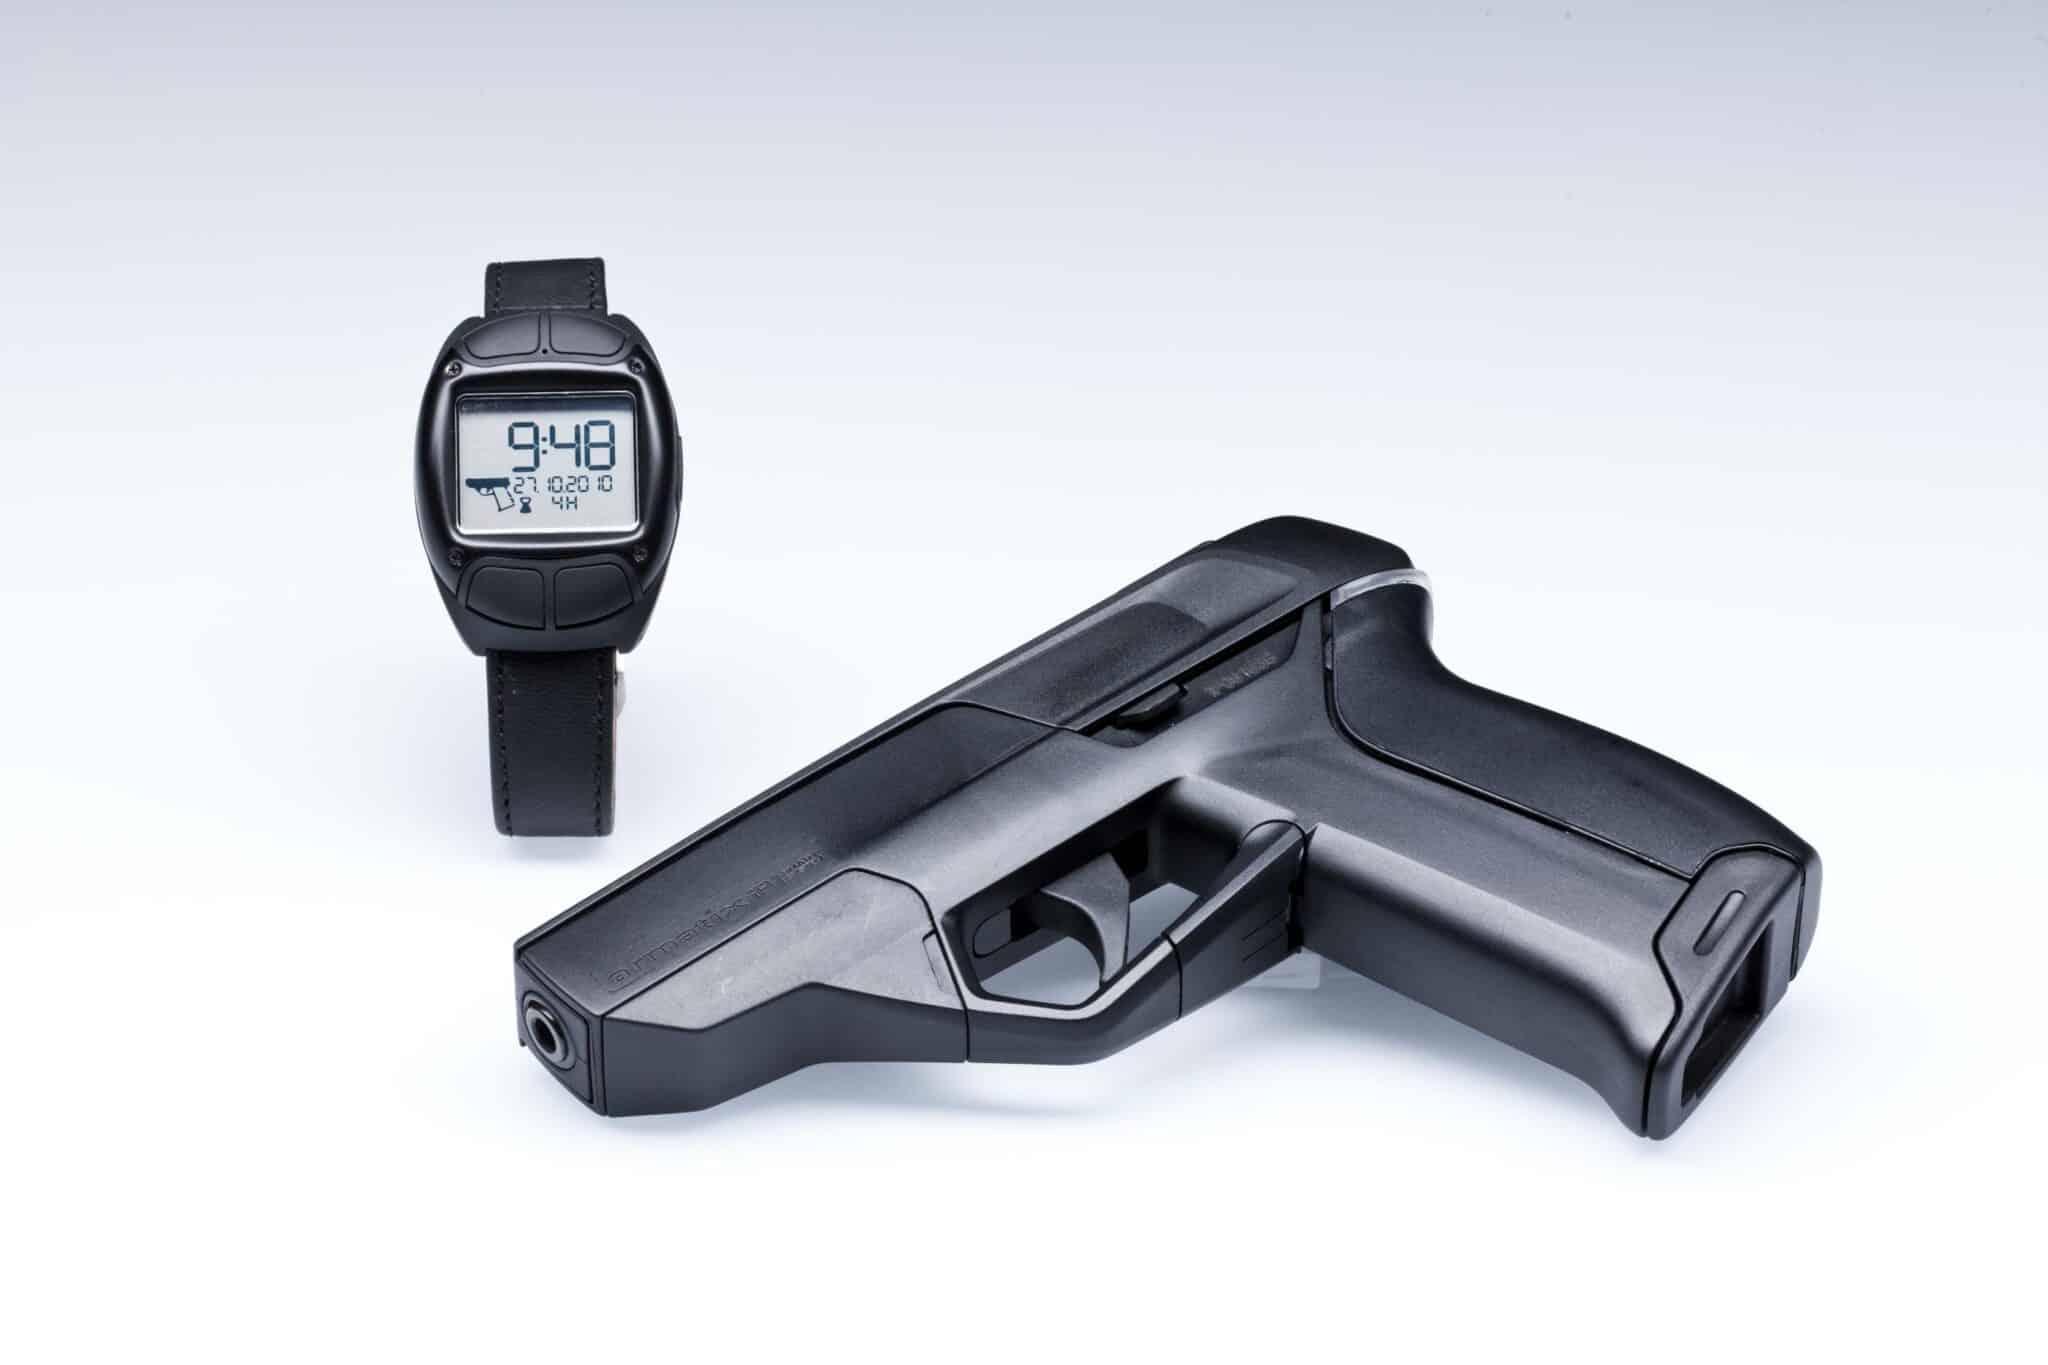 pistolet intelligent hack iot armatix